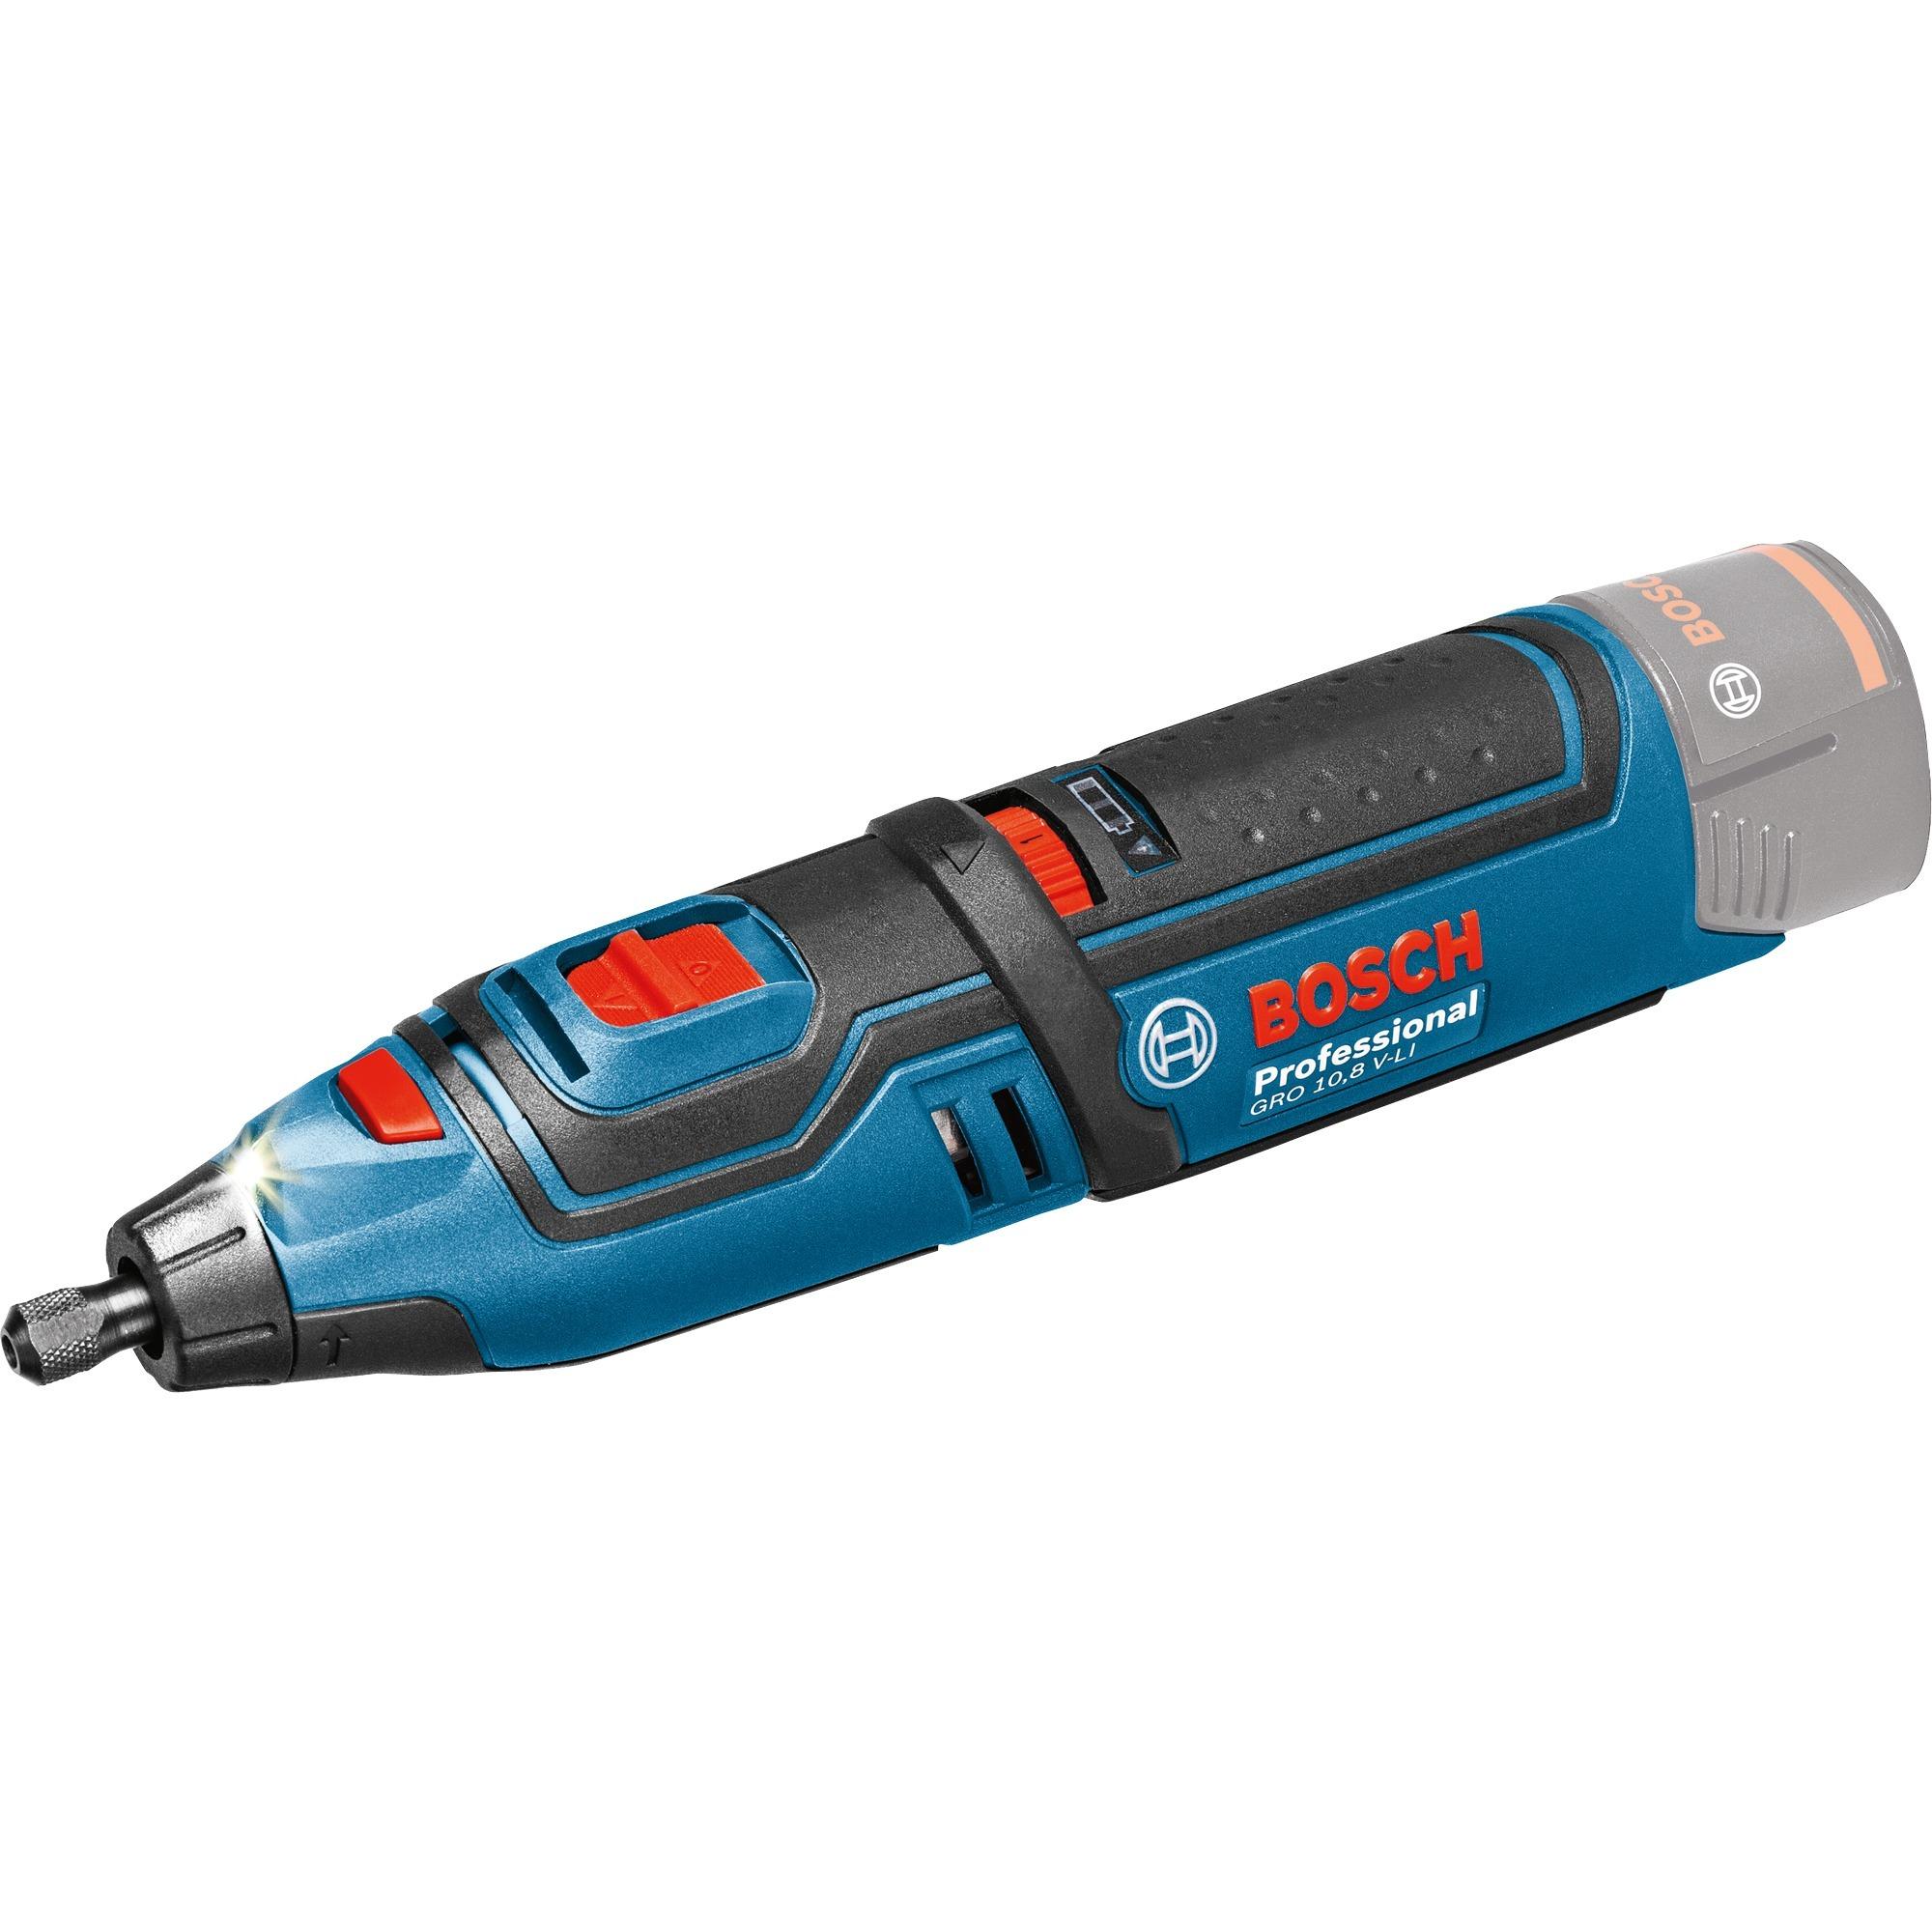 0 601 9C5 000 multiherramienta eléctrica 5000 RPM Negro, Azul, Herramienta multifunción